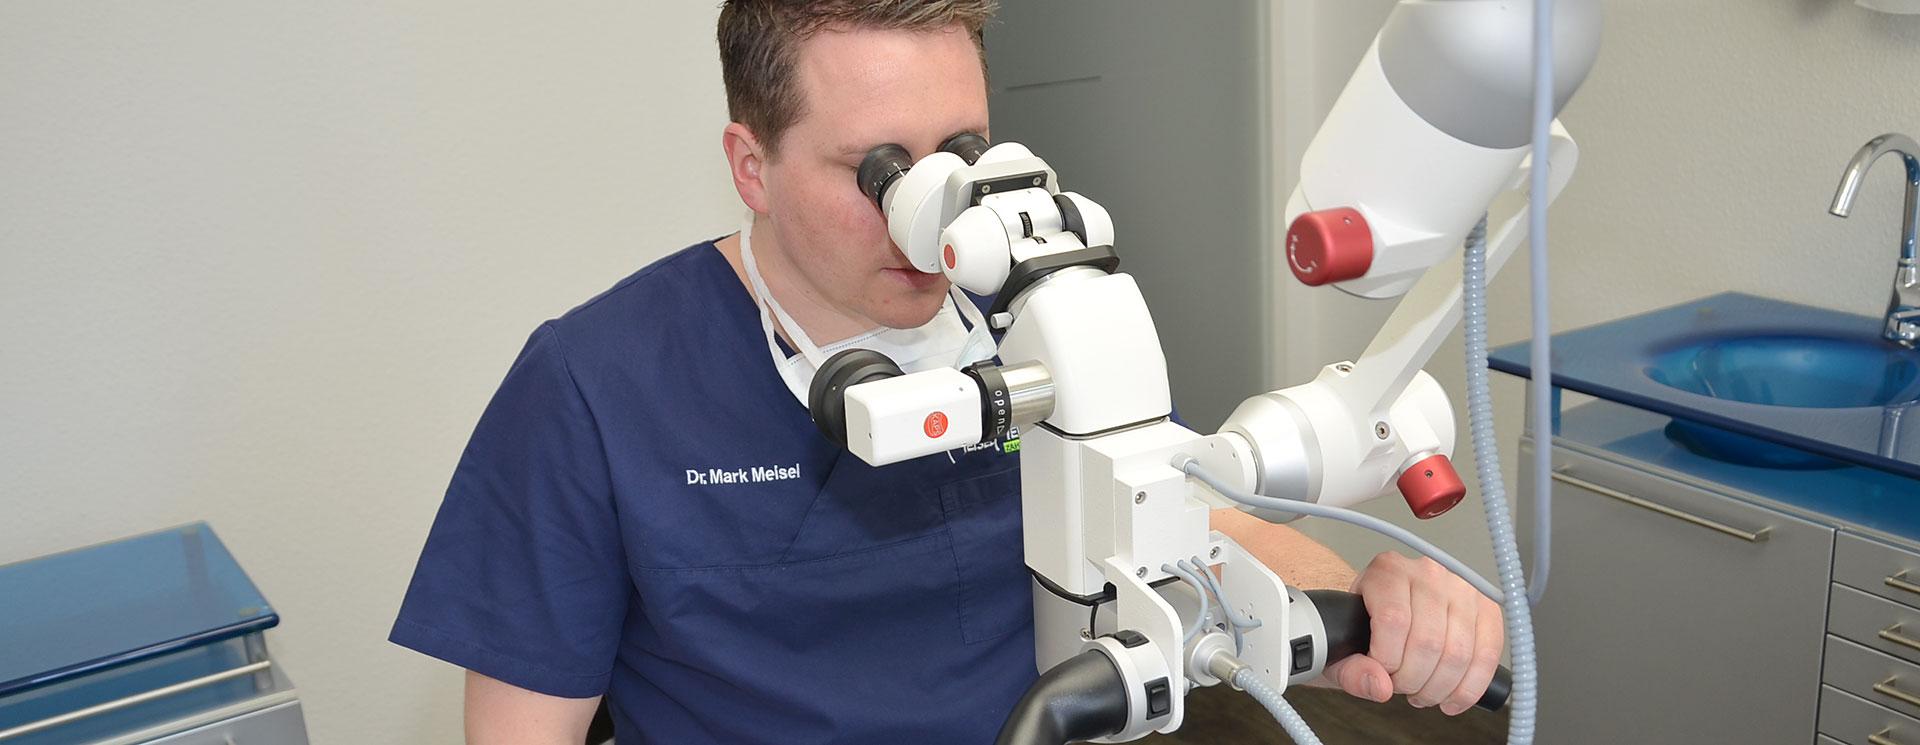 Wurzelbehandlung mit OP Mikroskop - Zahnarztpraxis Dr. Meisel Nürnberg